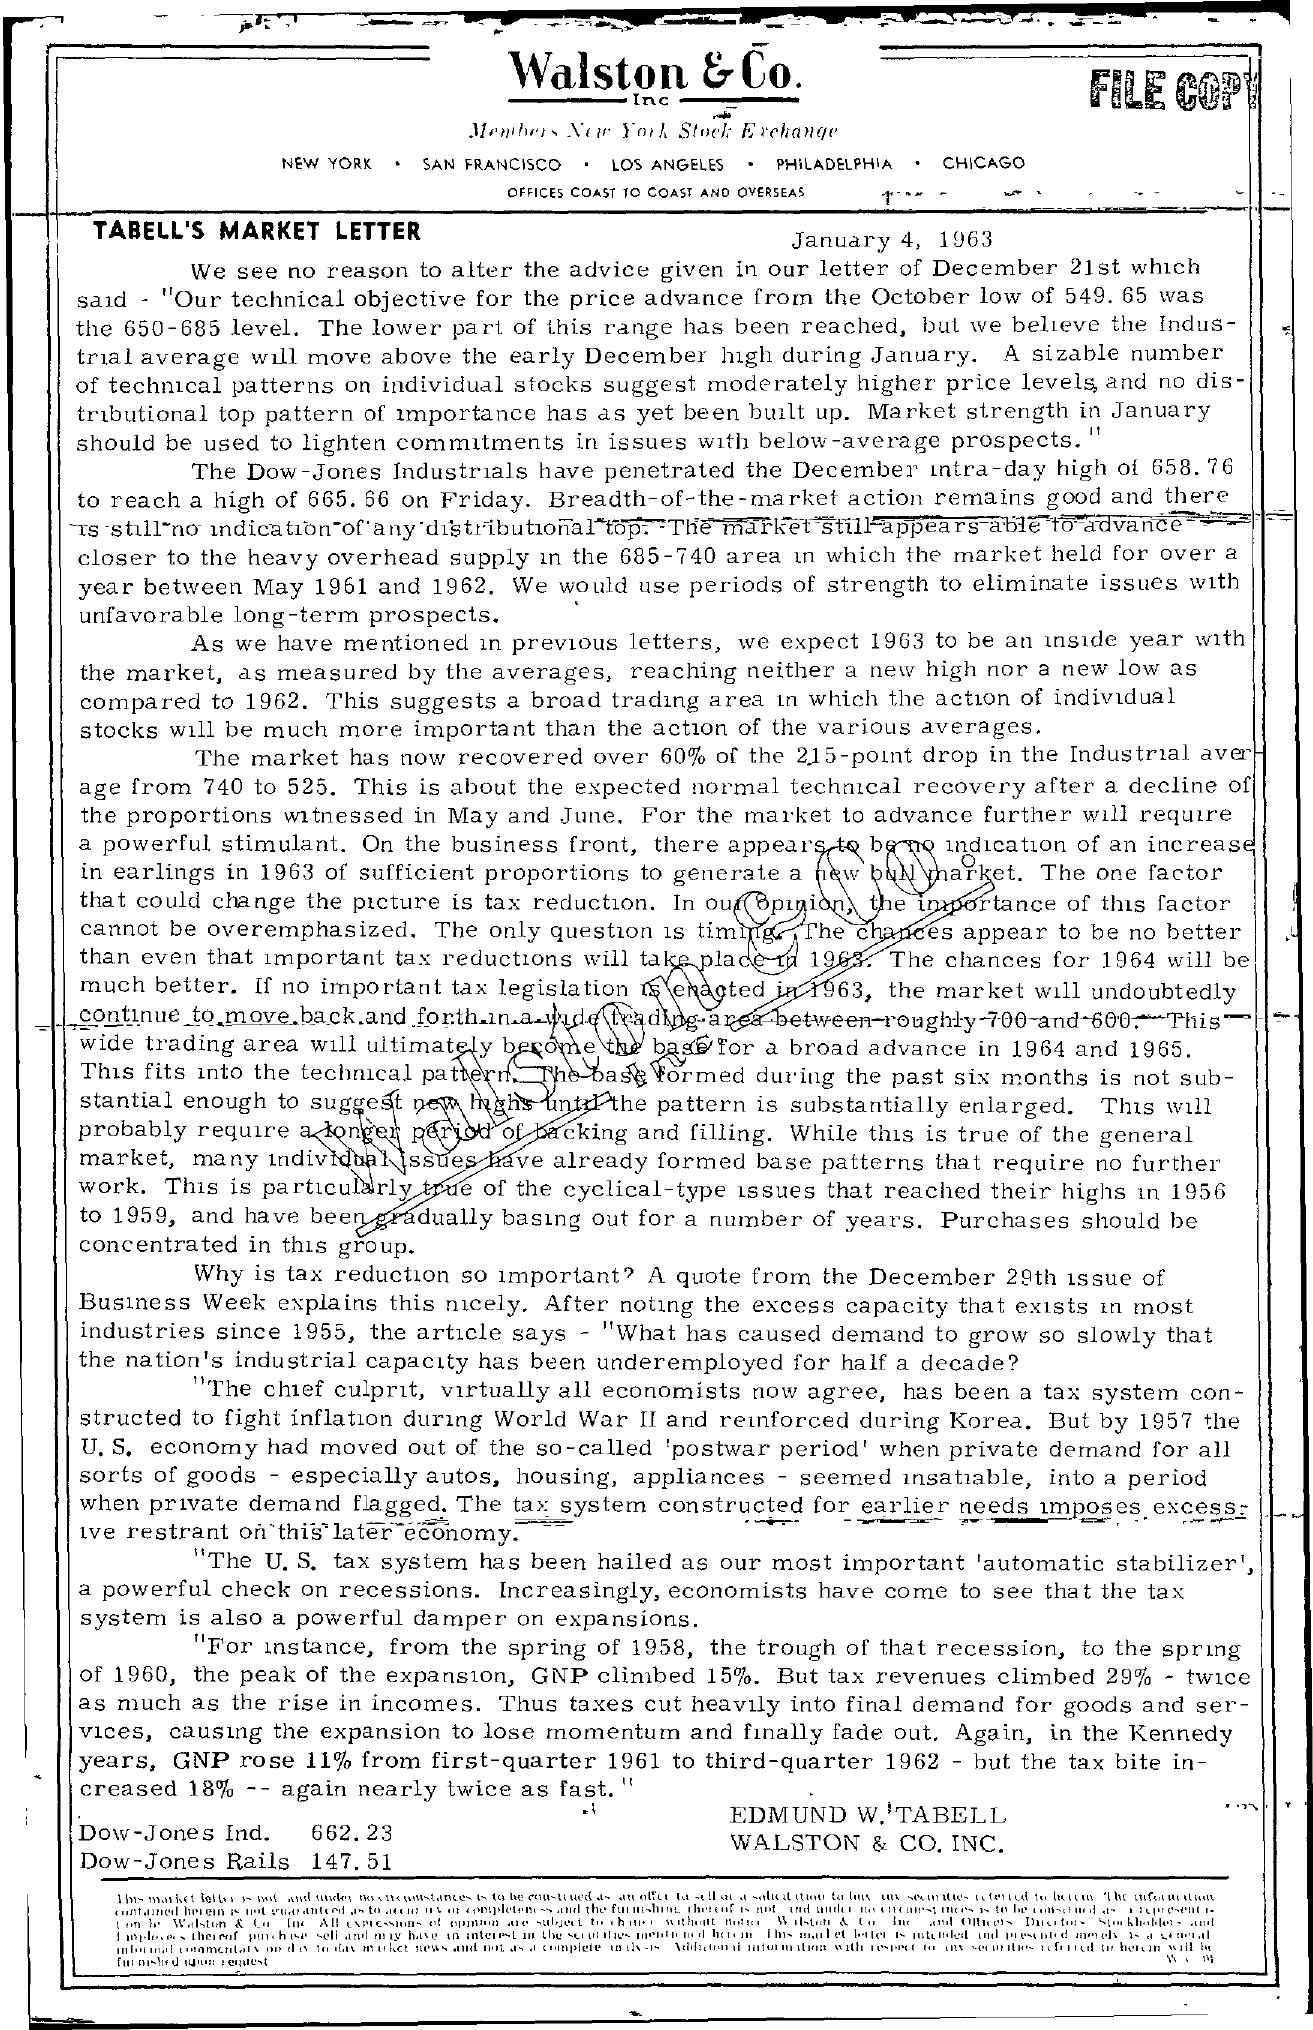 Tabell's Market Letter - January 04, 1963